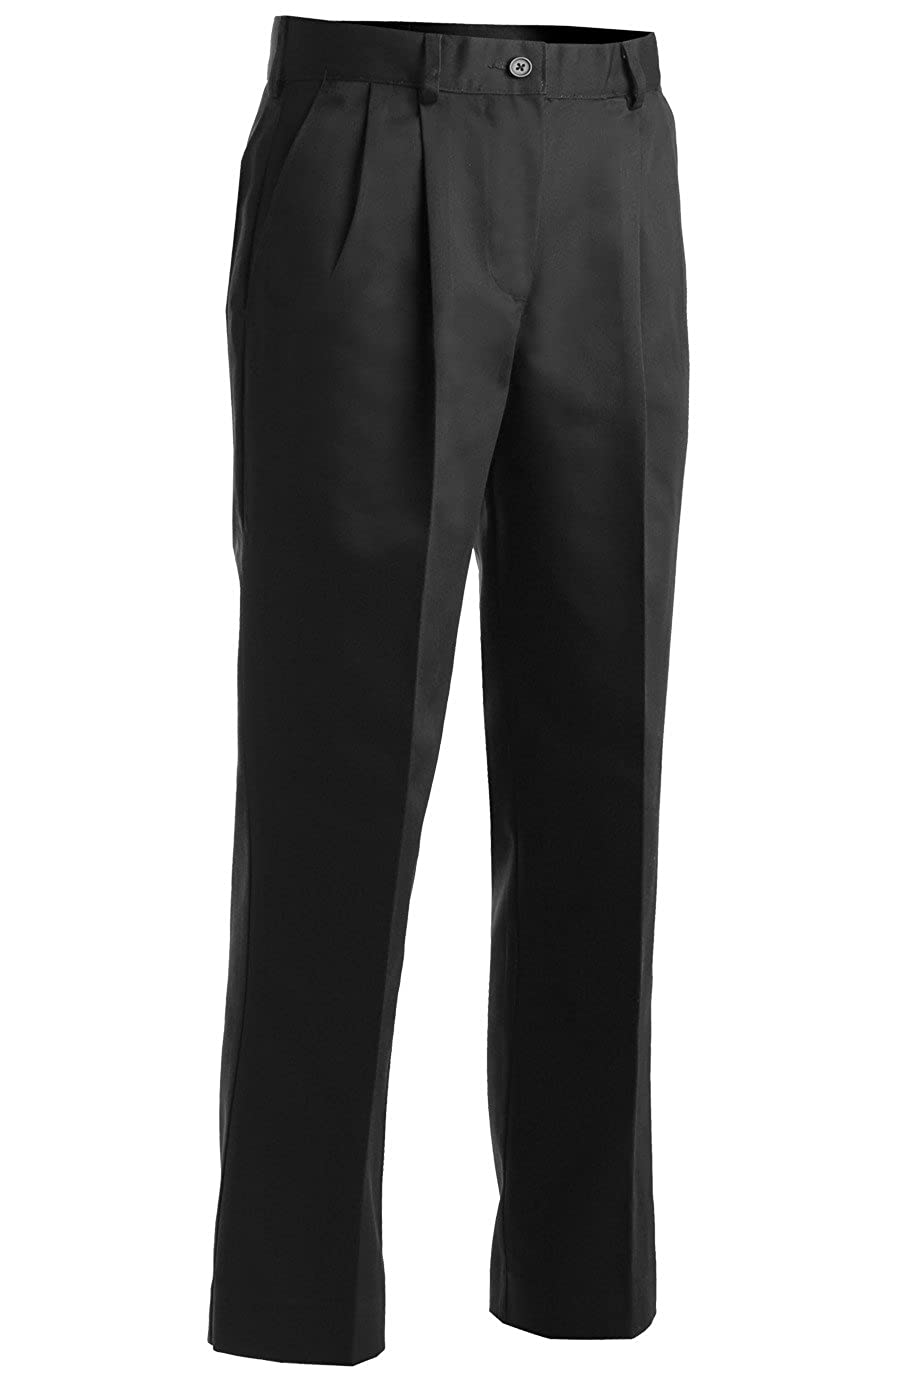 Ed Garments Women's Utility Pleated Pant, Black, 12 28 8667